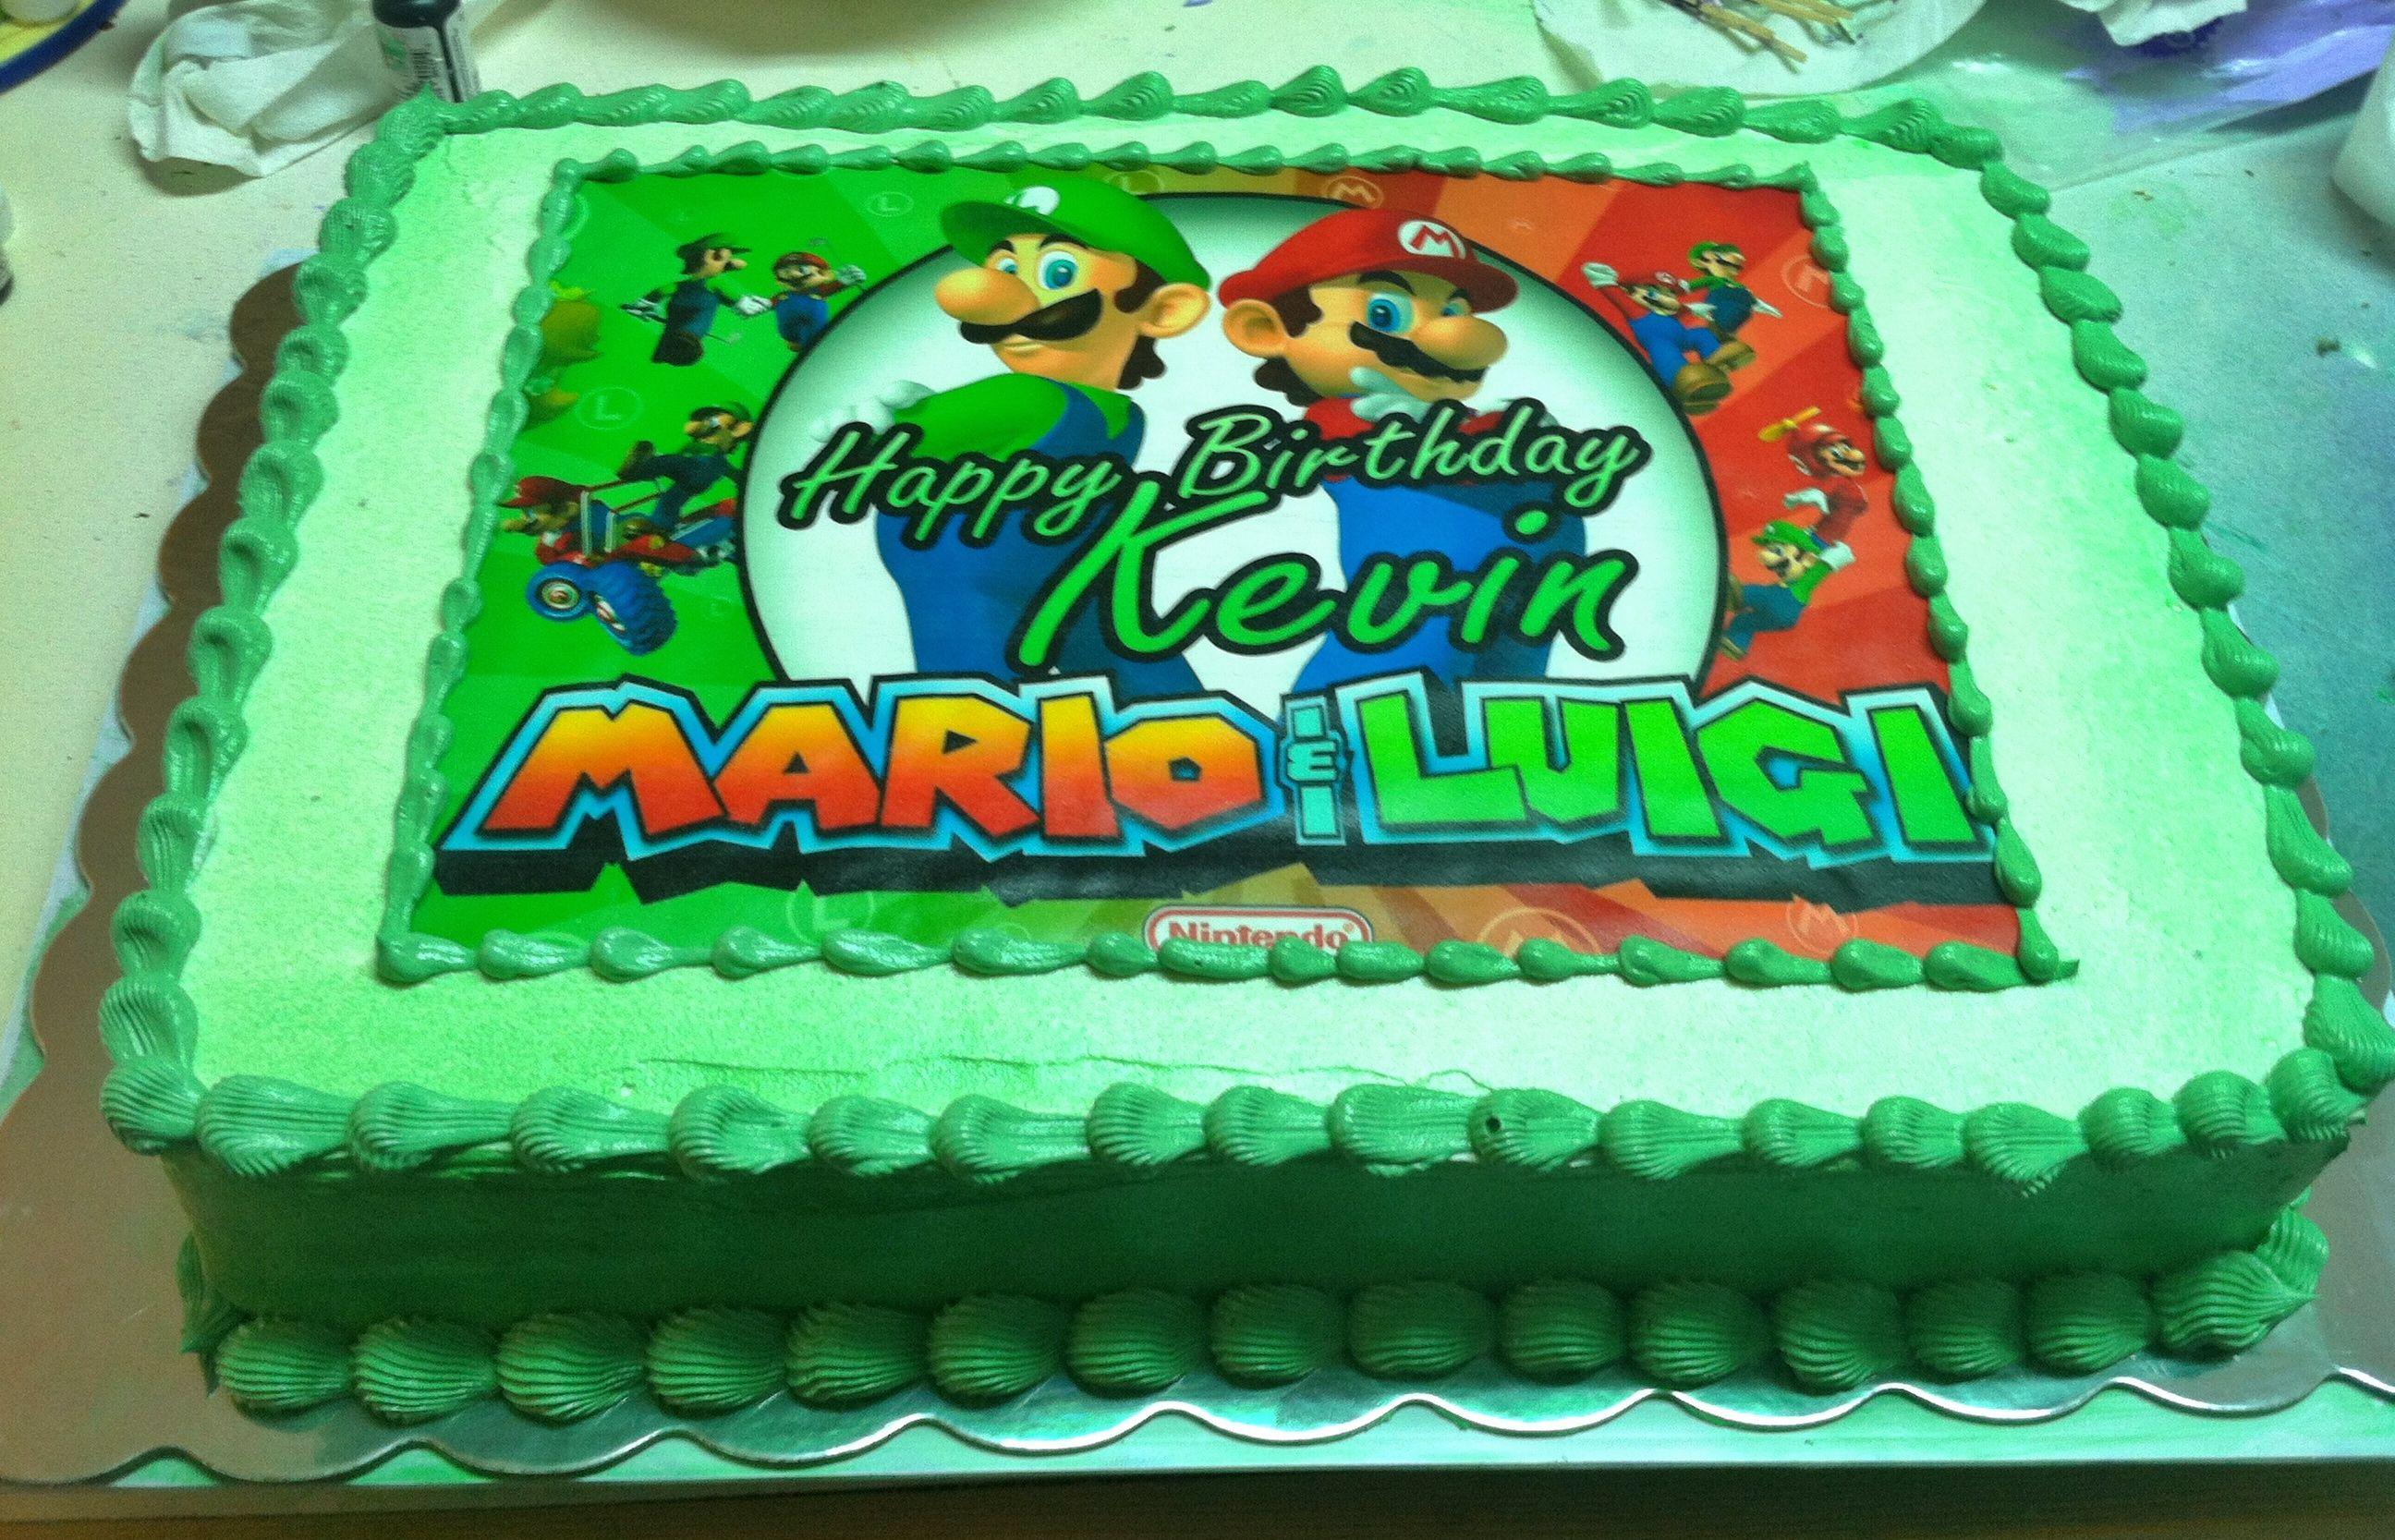 Mario And Luigi Ediblepearls Image Cake